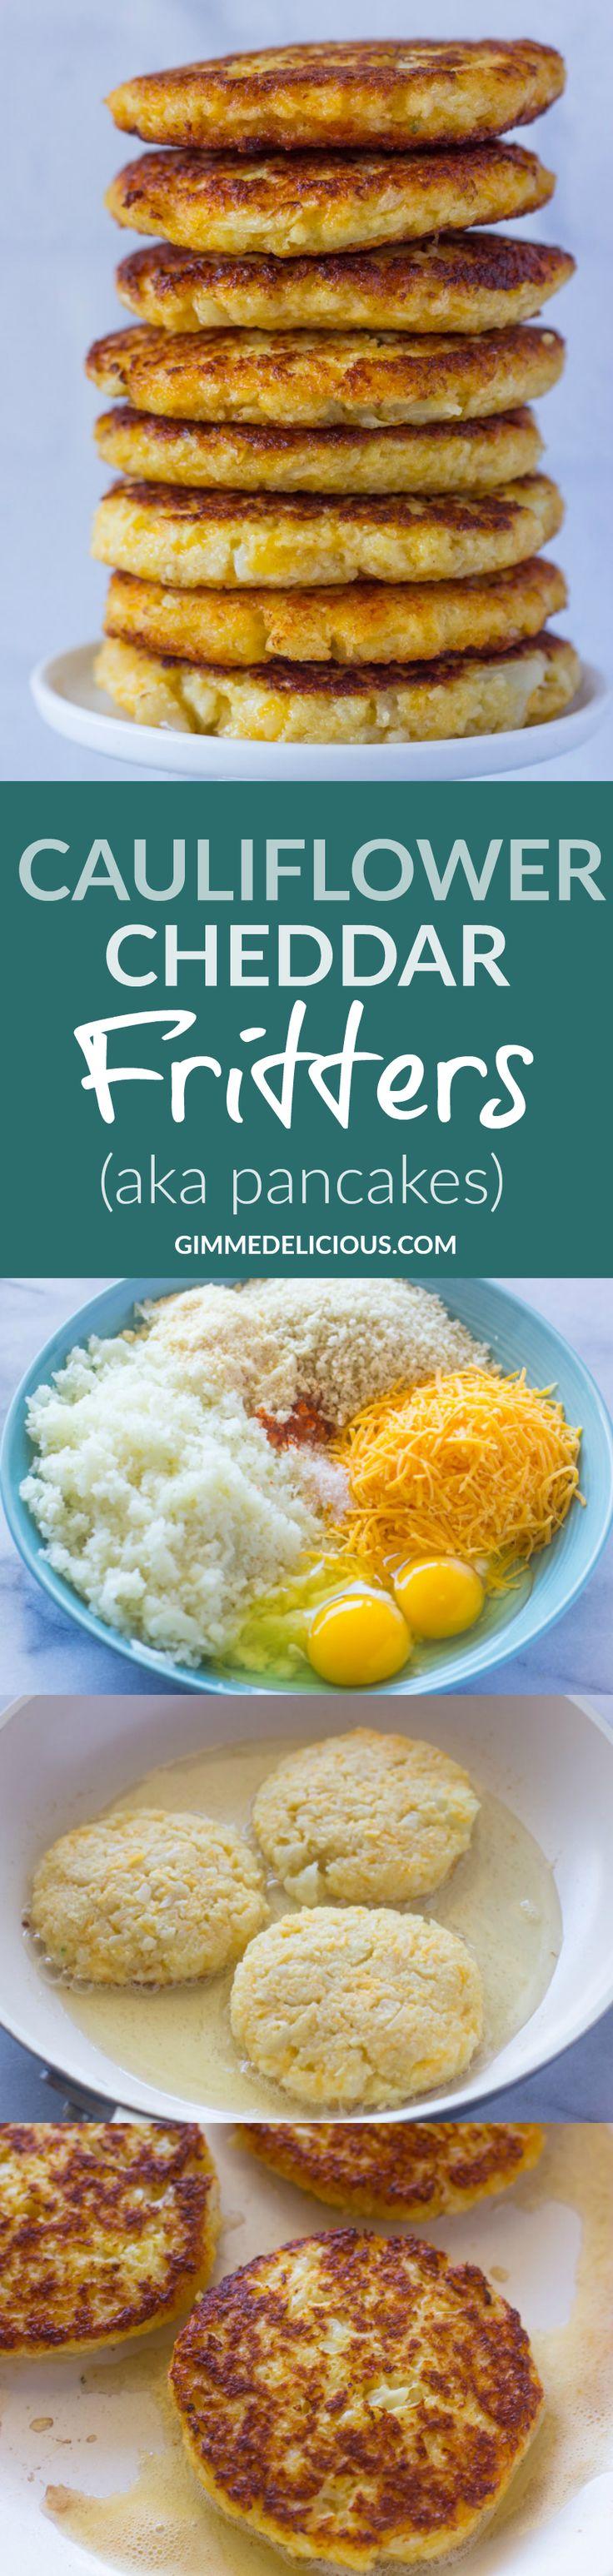 Cauliflower Cheddar Fritters (AKA Pancakes) #SKINNY #HEALTHY #LOWCARB